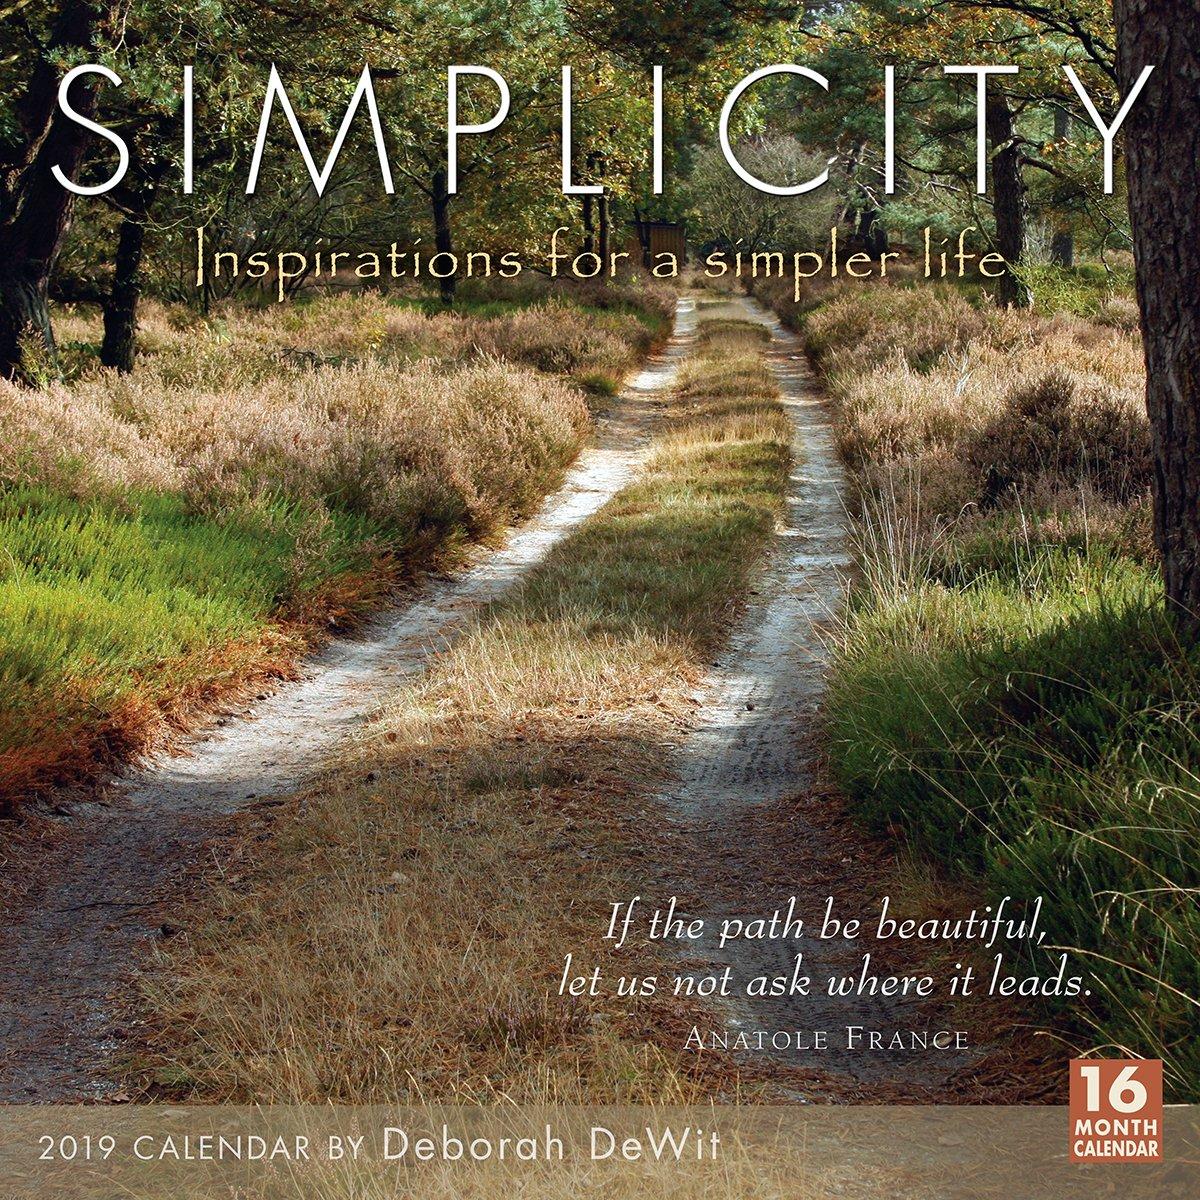 2019 Simplicity — Inspirations for a Simpler Life 16-Month Wall Calendar: by Sellers Publishing, 12x12 (CA-0403) Calendar – Wall Calendar, Jun 22 2018 Deborah DeWit Inc. 1531904033 /